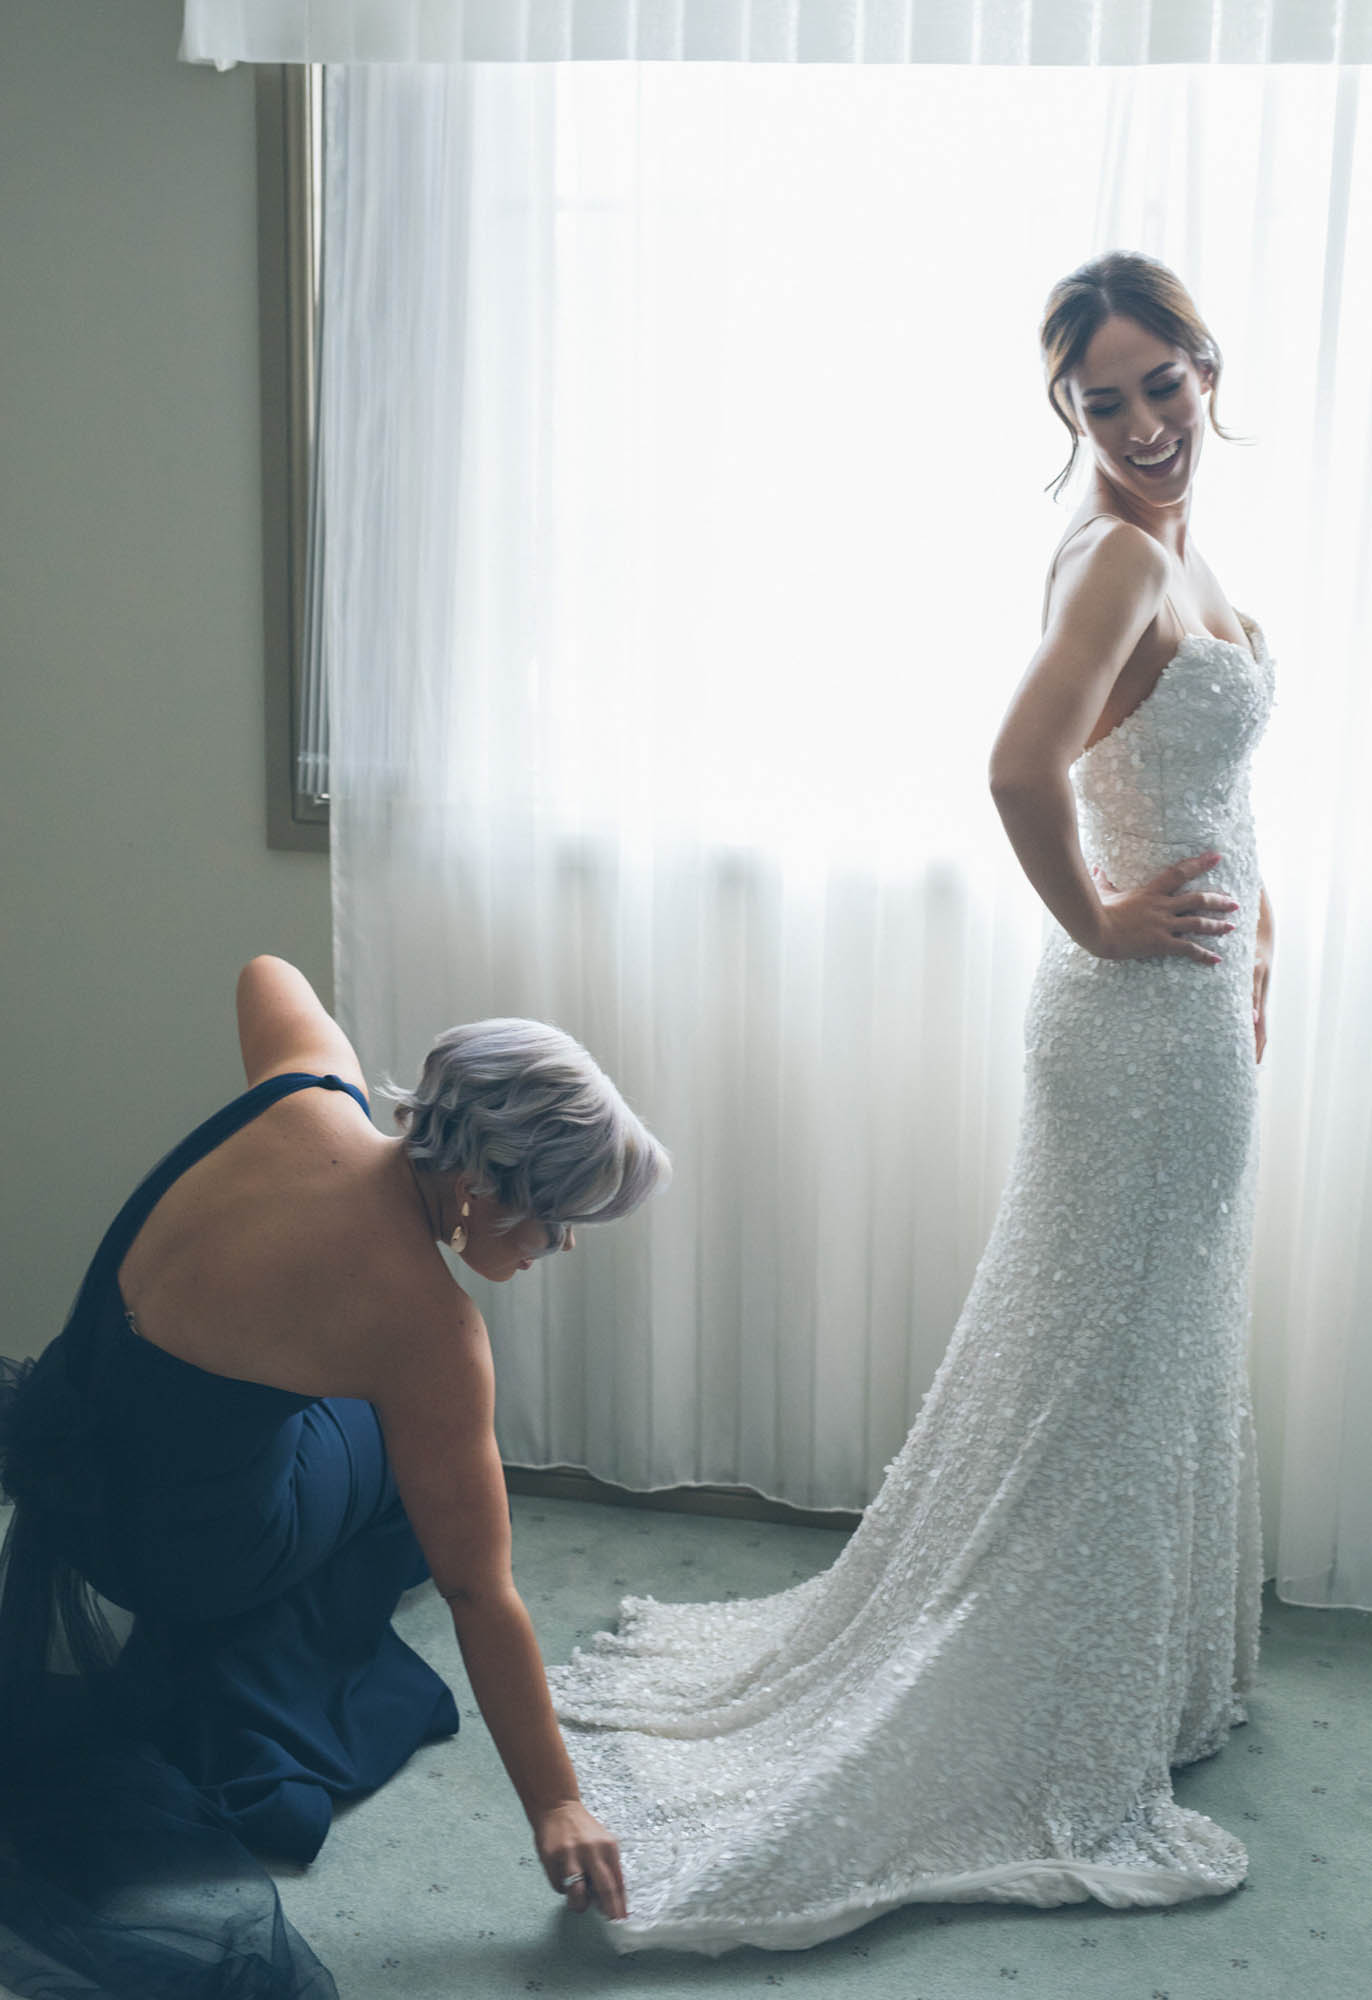 MacDougall-Photography-Sydney-Wedding-Photographers-3.jpg